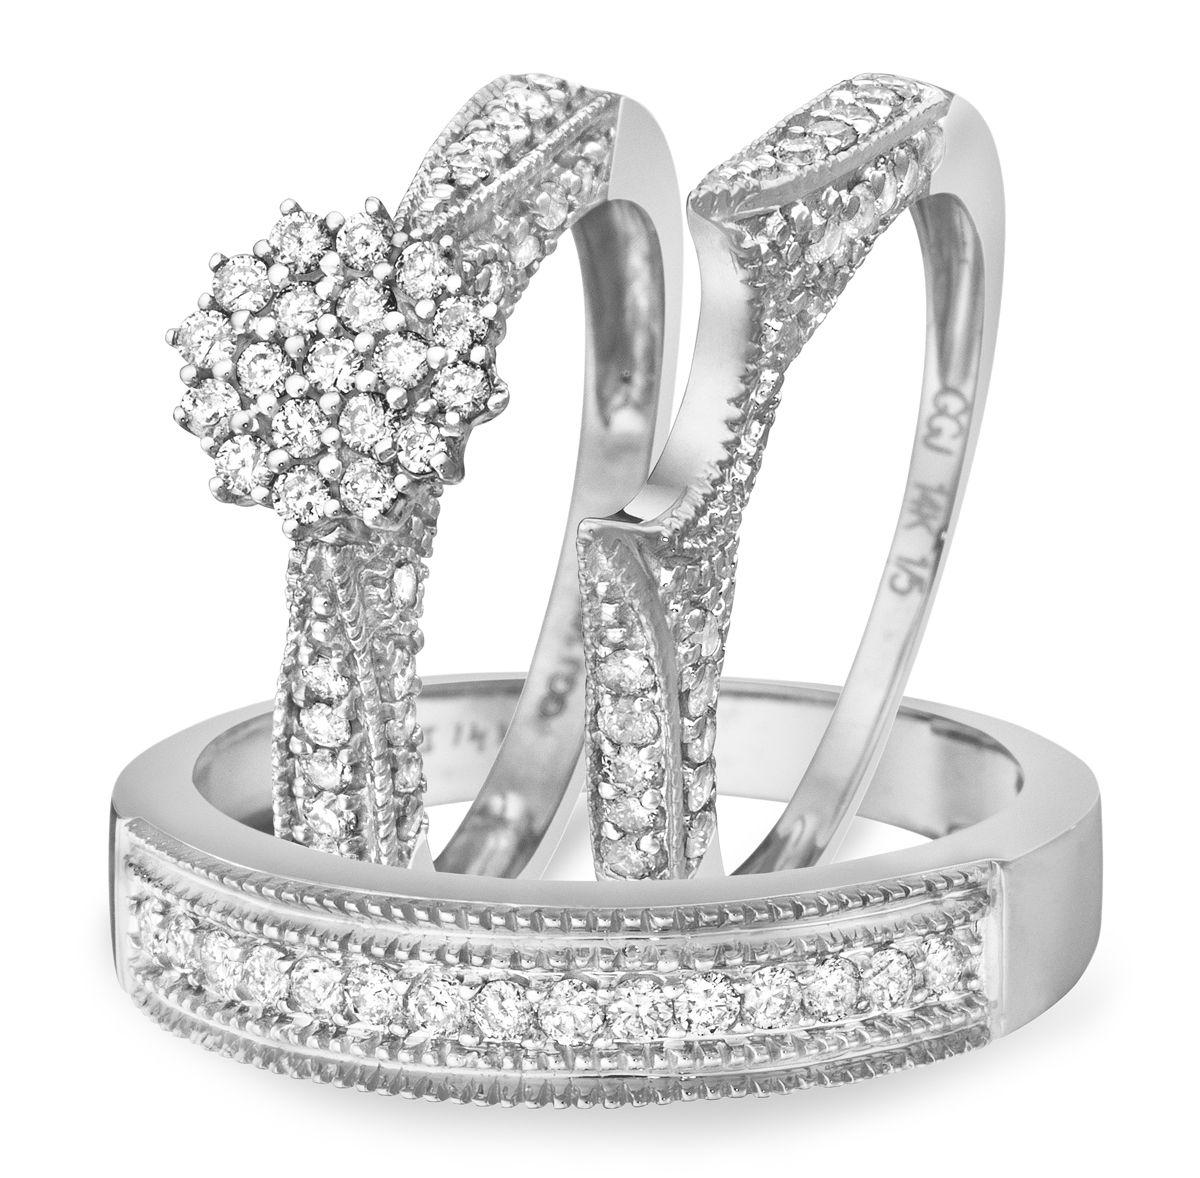 1 Carat Diamond Trio Wedding Ring Set 14k White Gold My Trio Rings Bt103w14k Wedding Ring Trio Sets Wedding Ring Sets Diamond Wedding Sets